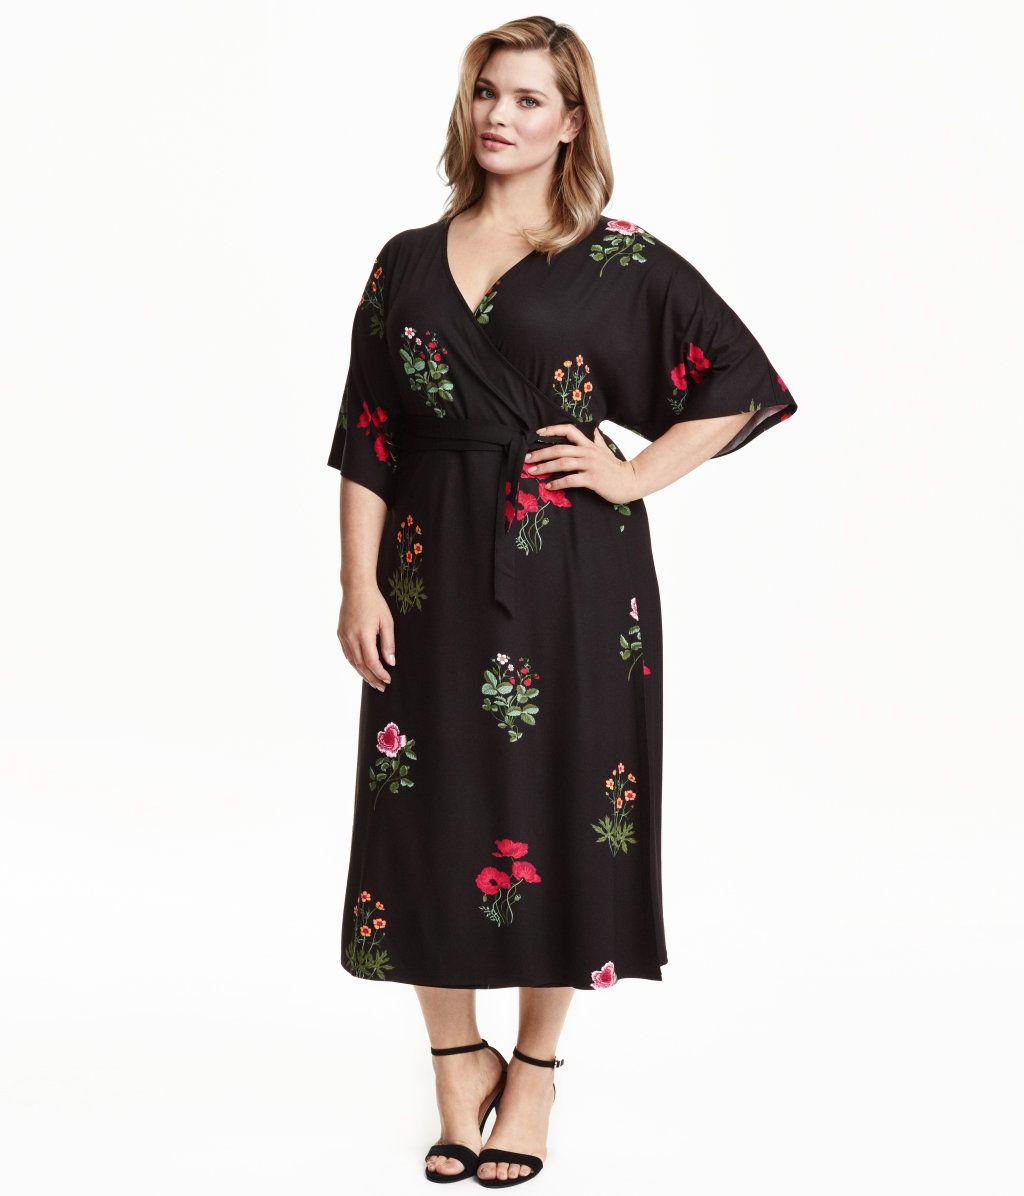 Hm wrapfront dress product detail hm fashion